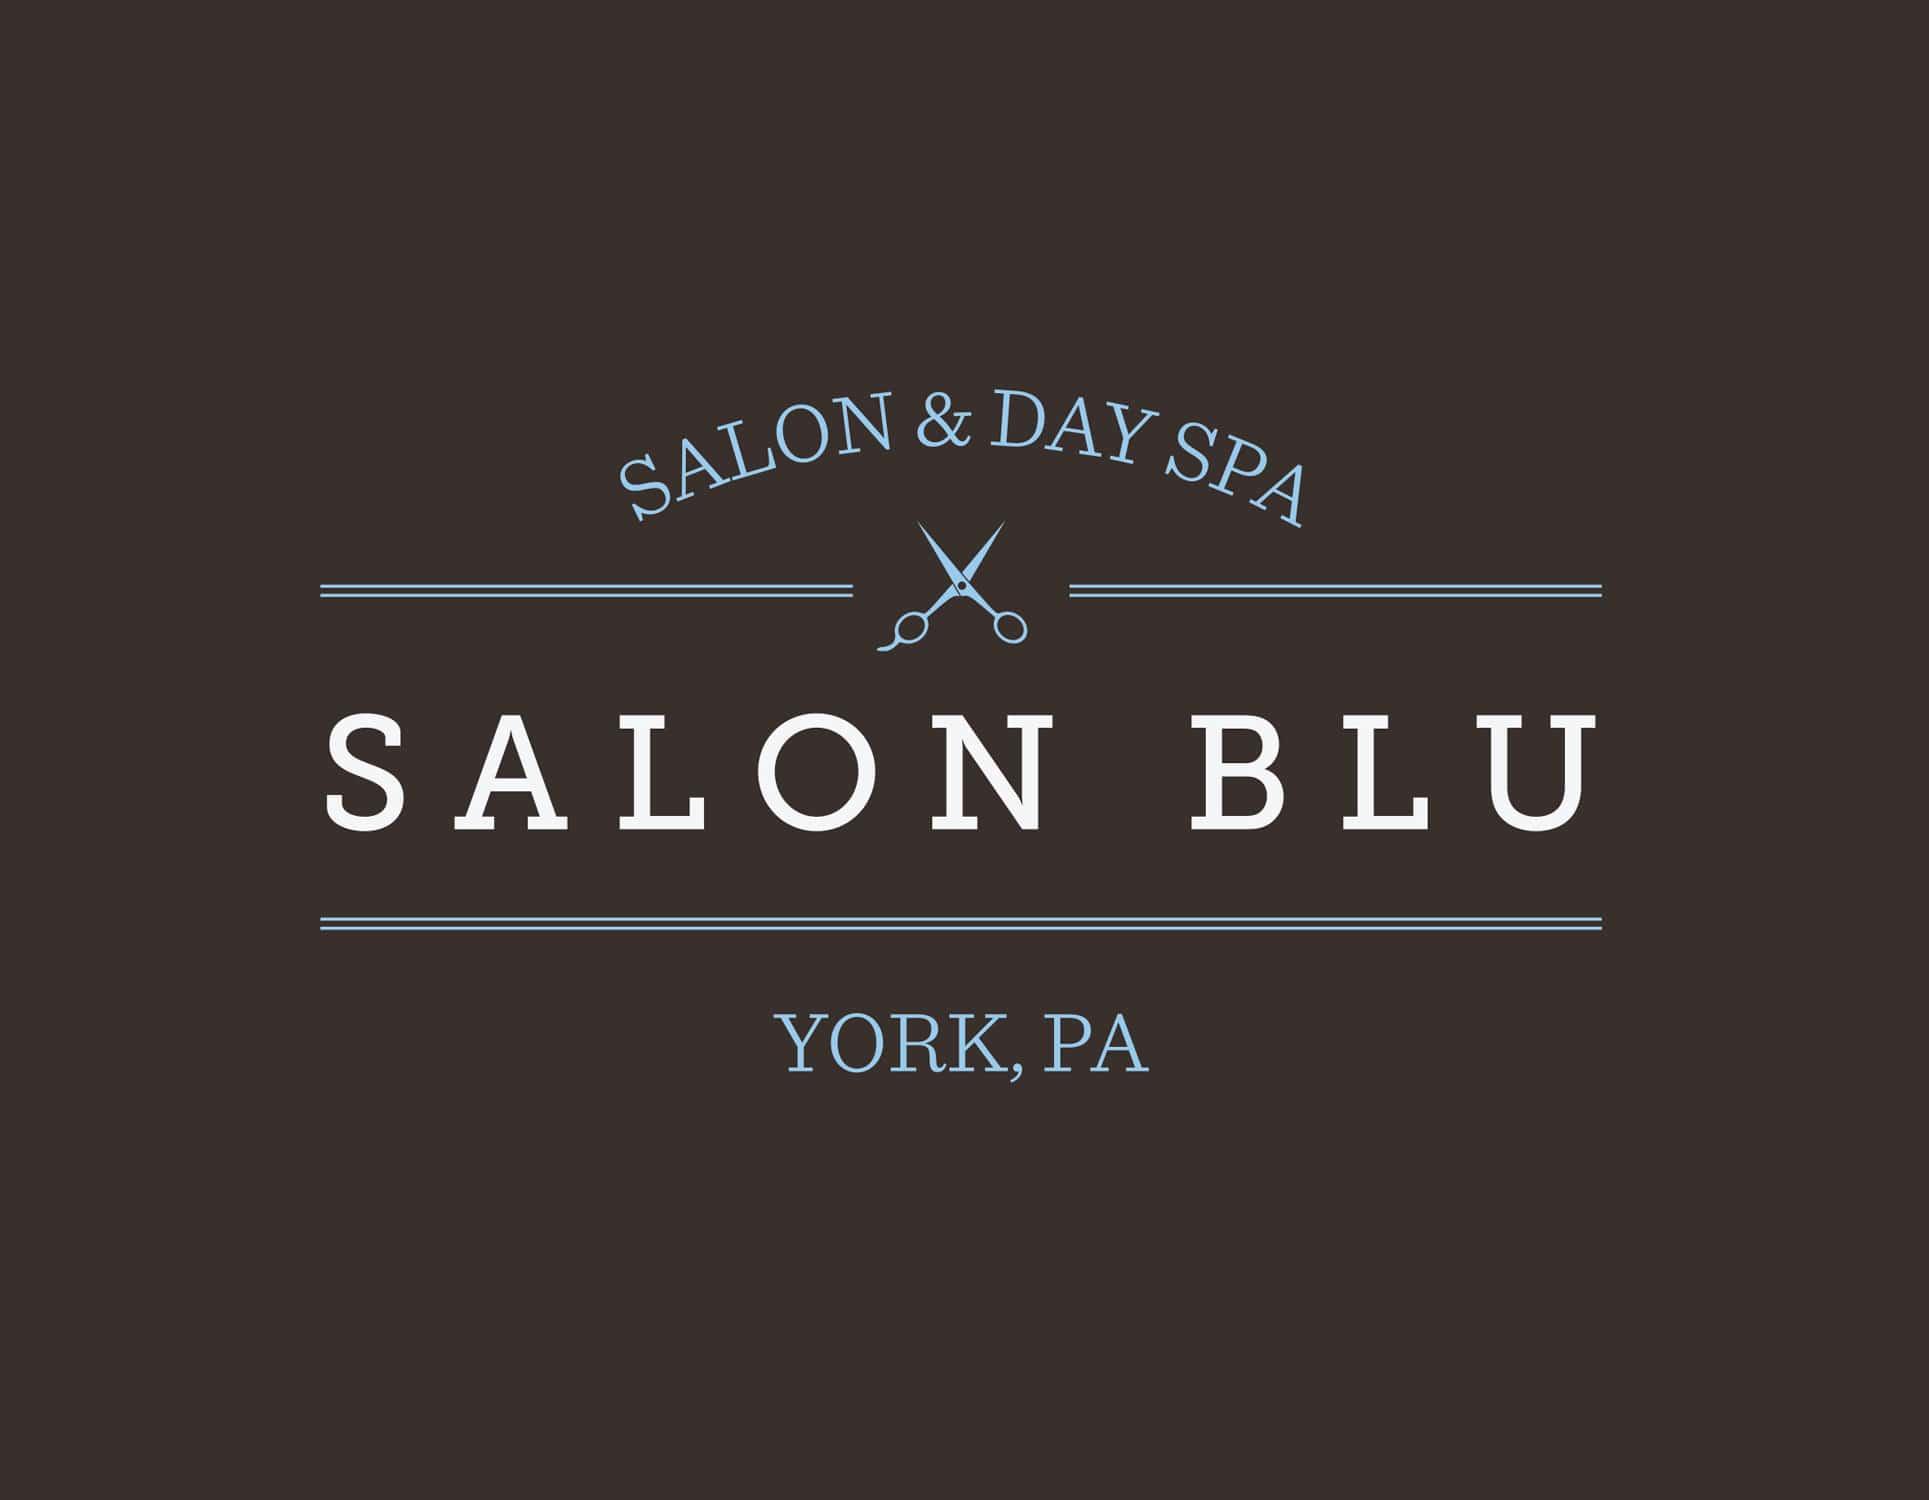 Salon Blu - York, PA - Logo Design by SG, LLC